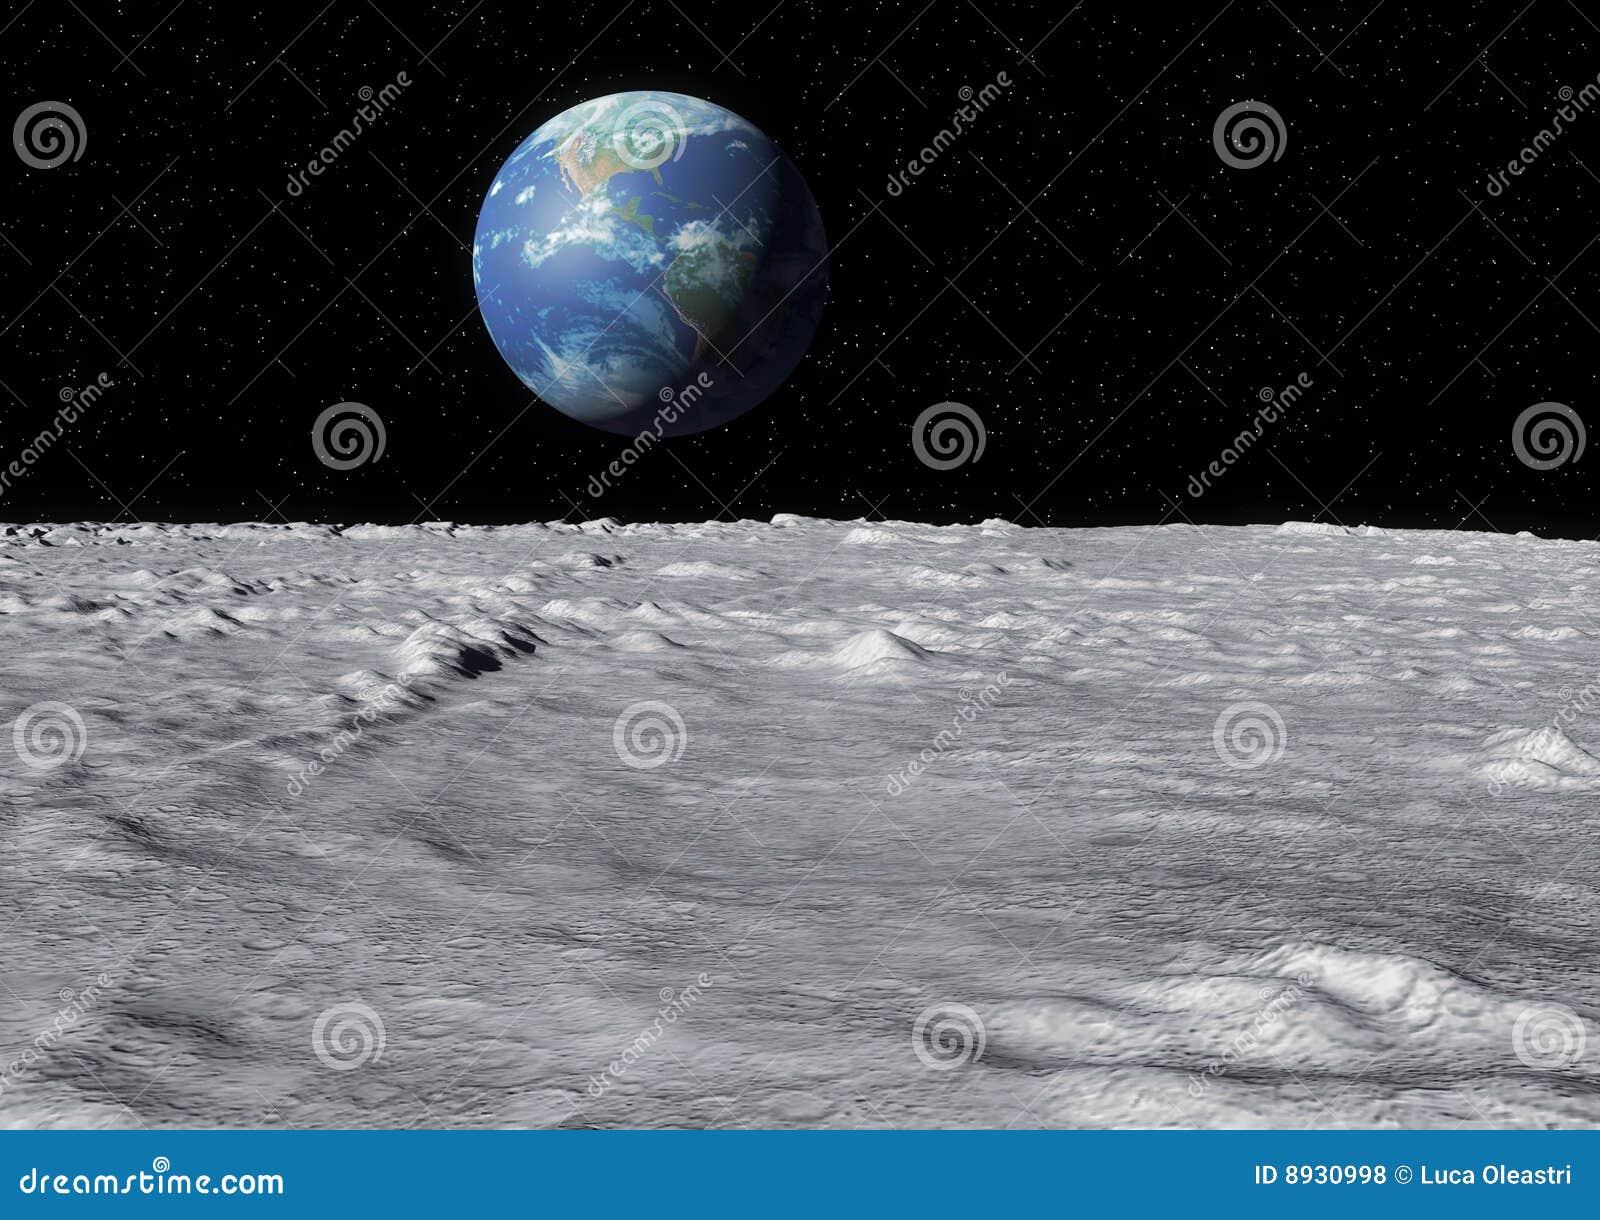 Earth moon surface